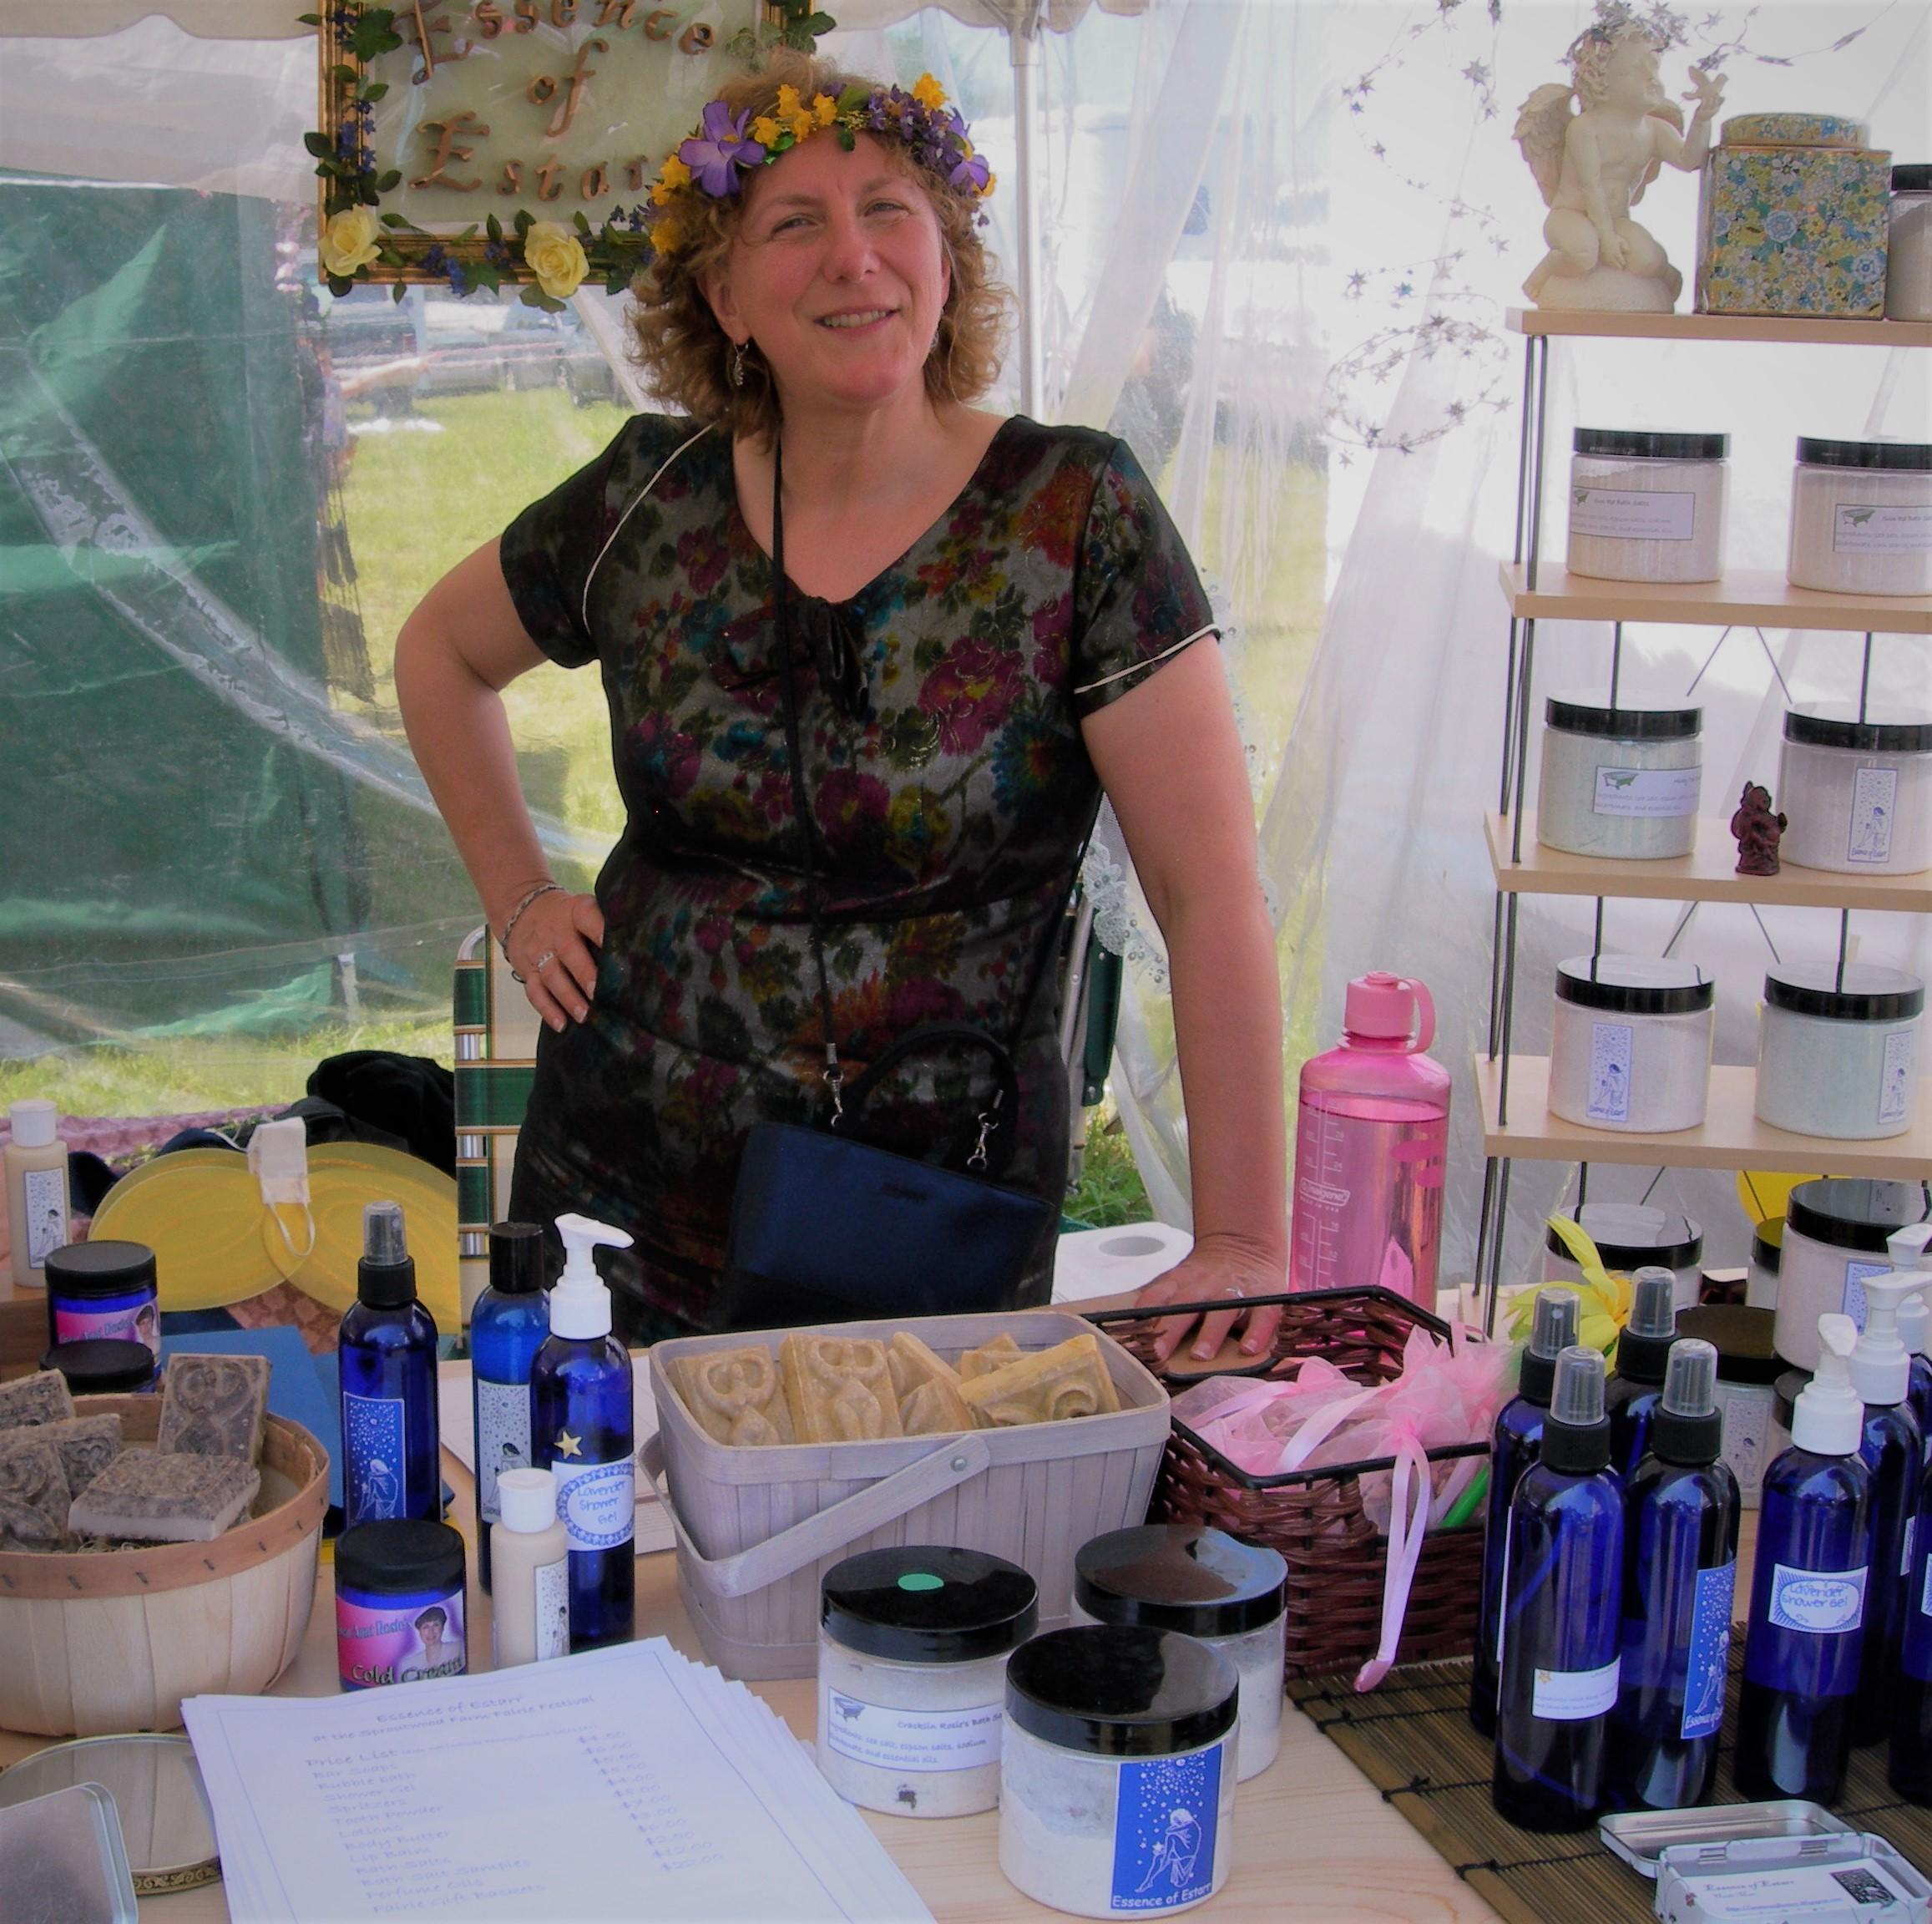 Essence of Estarr at the Fairy Festival